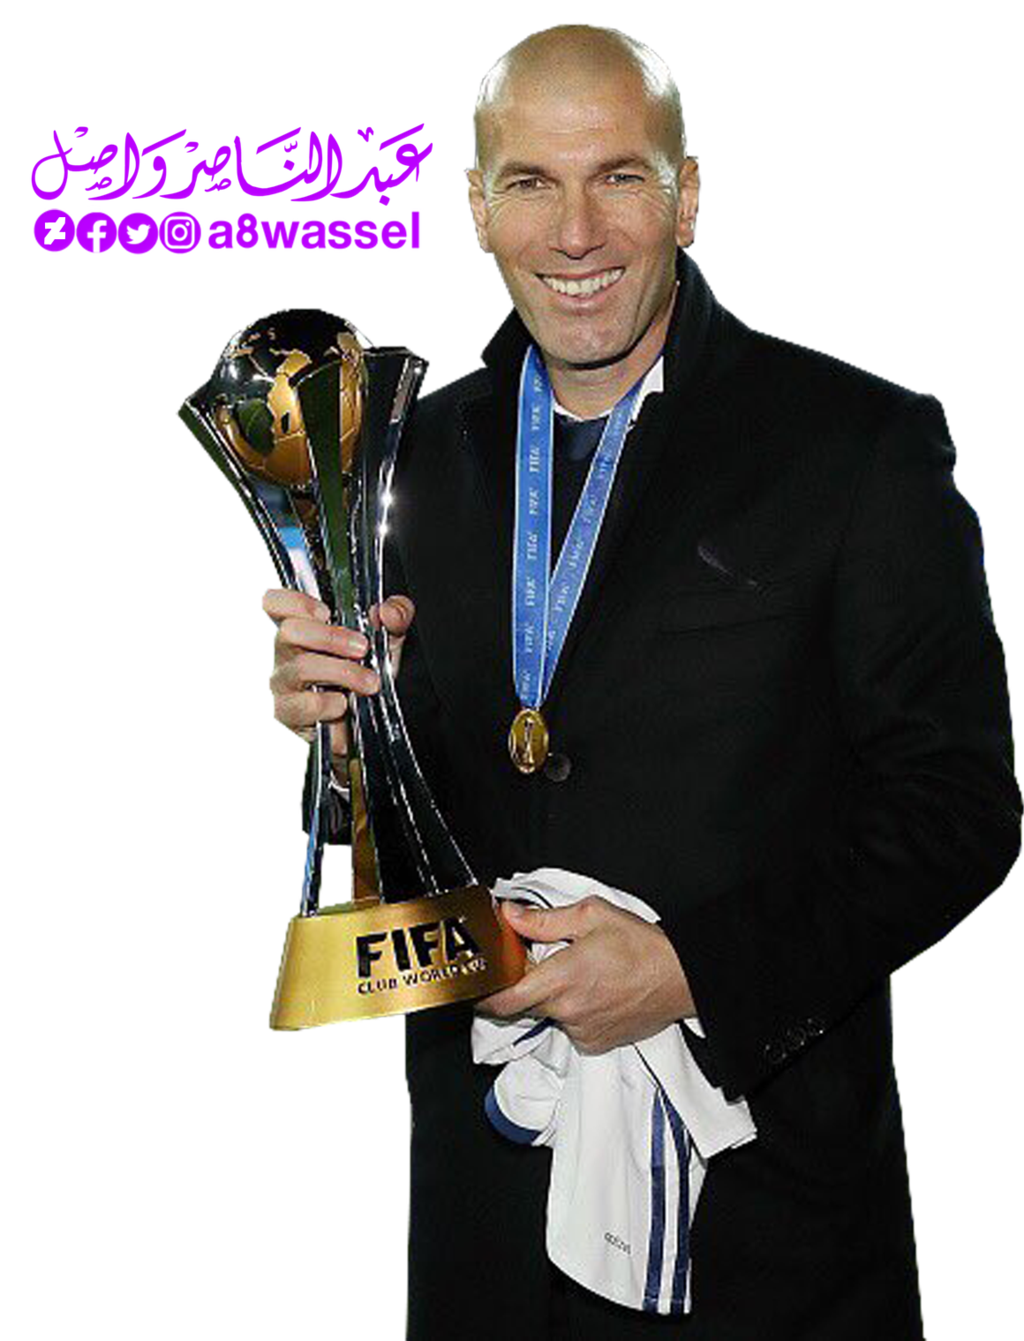 . PlusPng.com Zinedine Zidane - Real Madrid coach by A8WASSEL - Zidane PNG